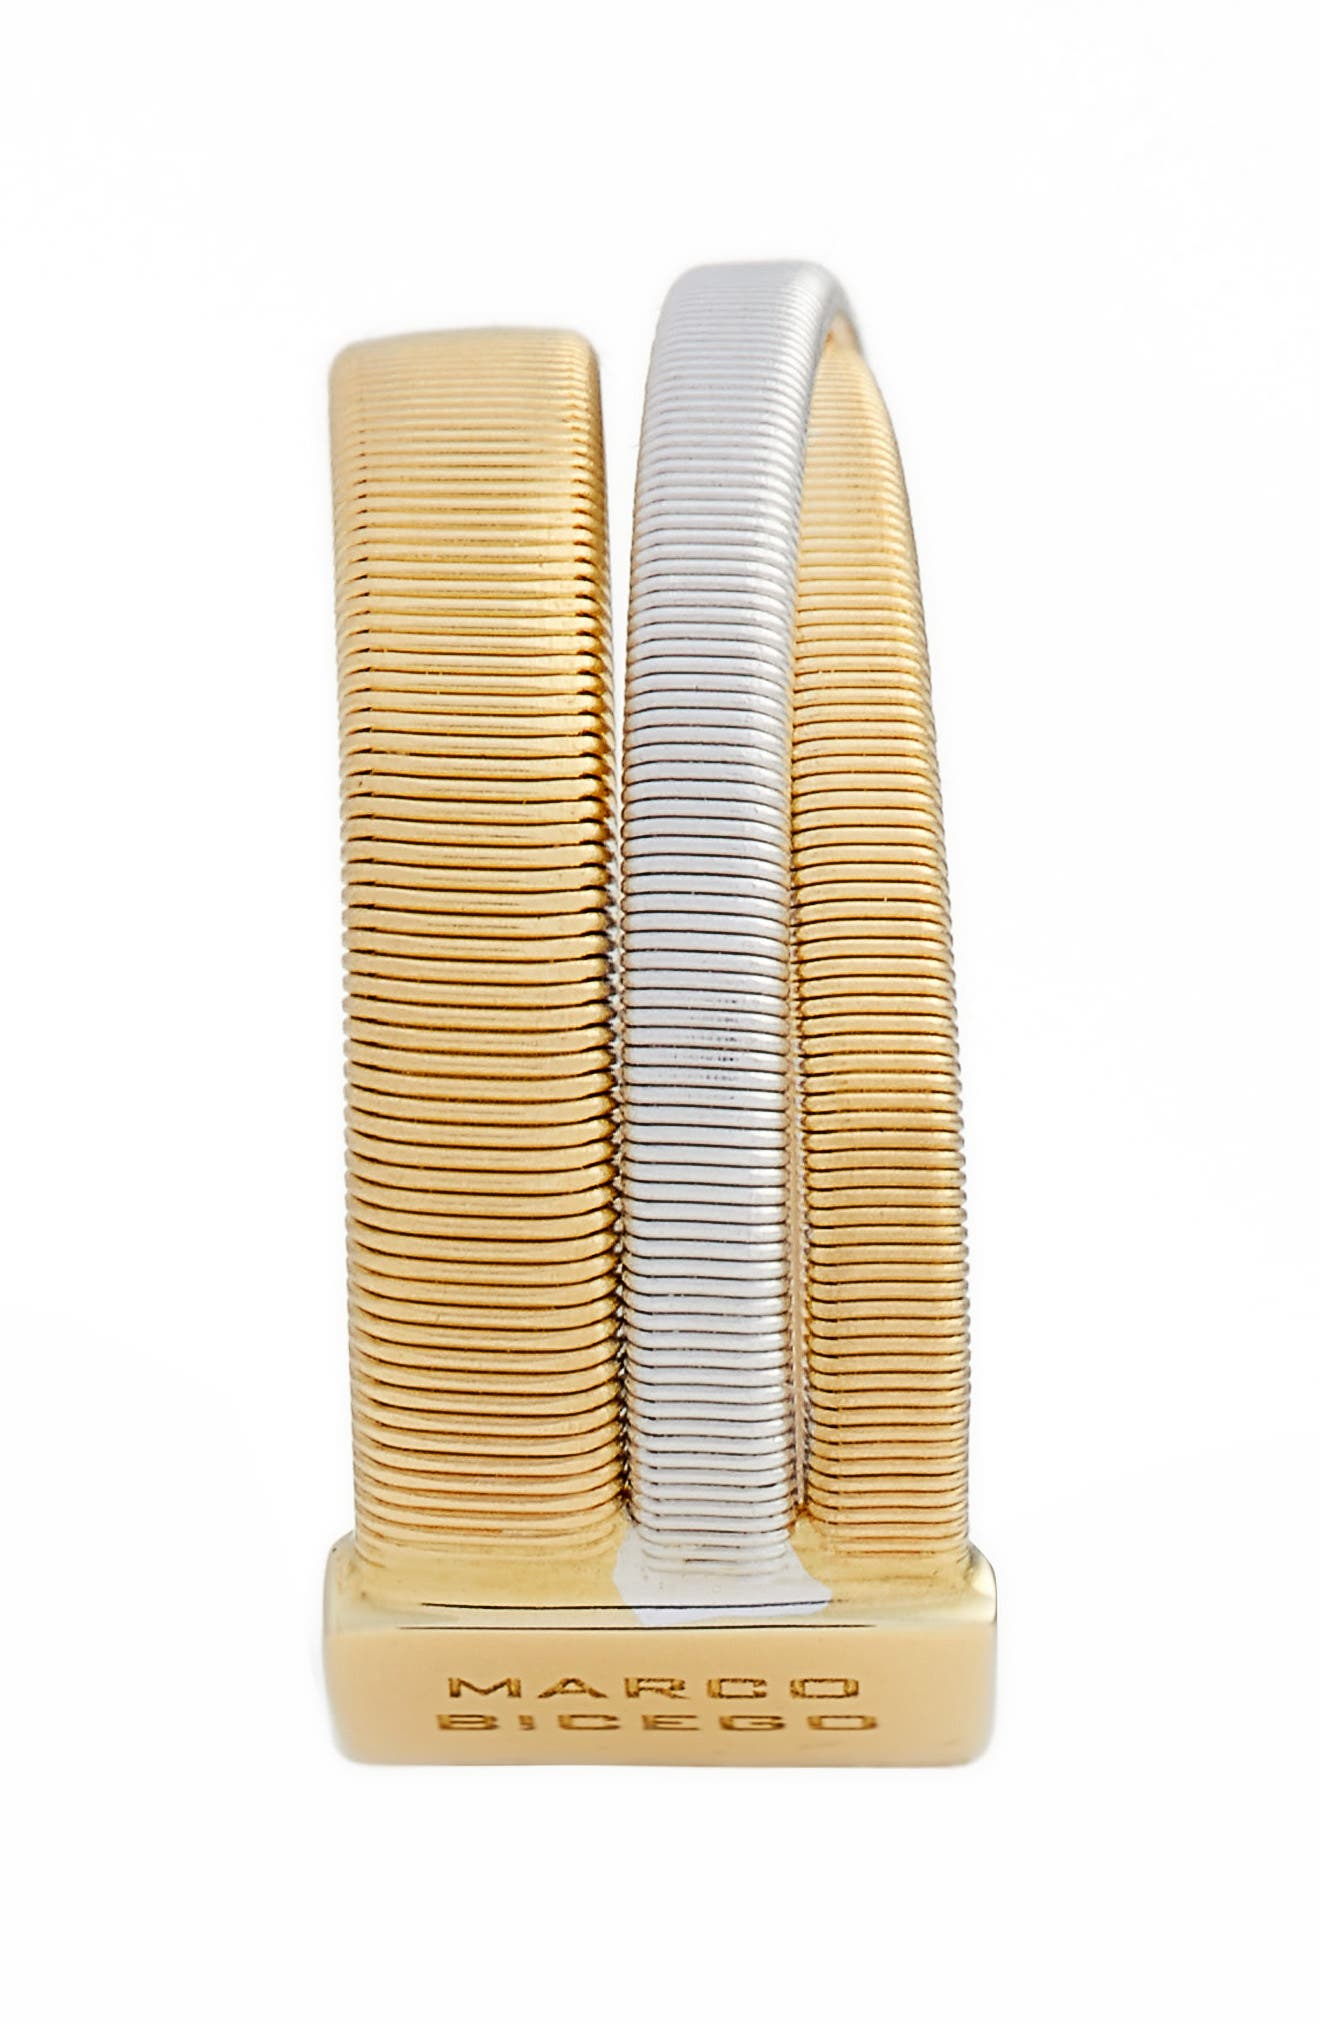 Masai Two-Tone Ring,                             Alternate thumbnail 2, color,                             YELLOW GOLD/ WHITE GOLD